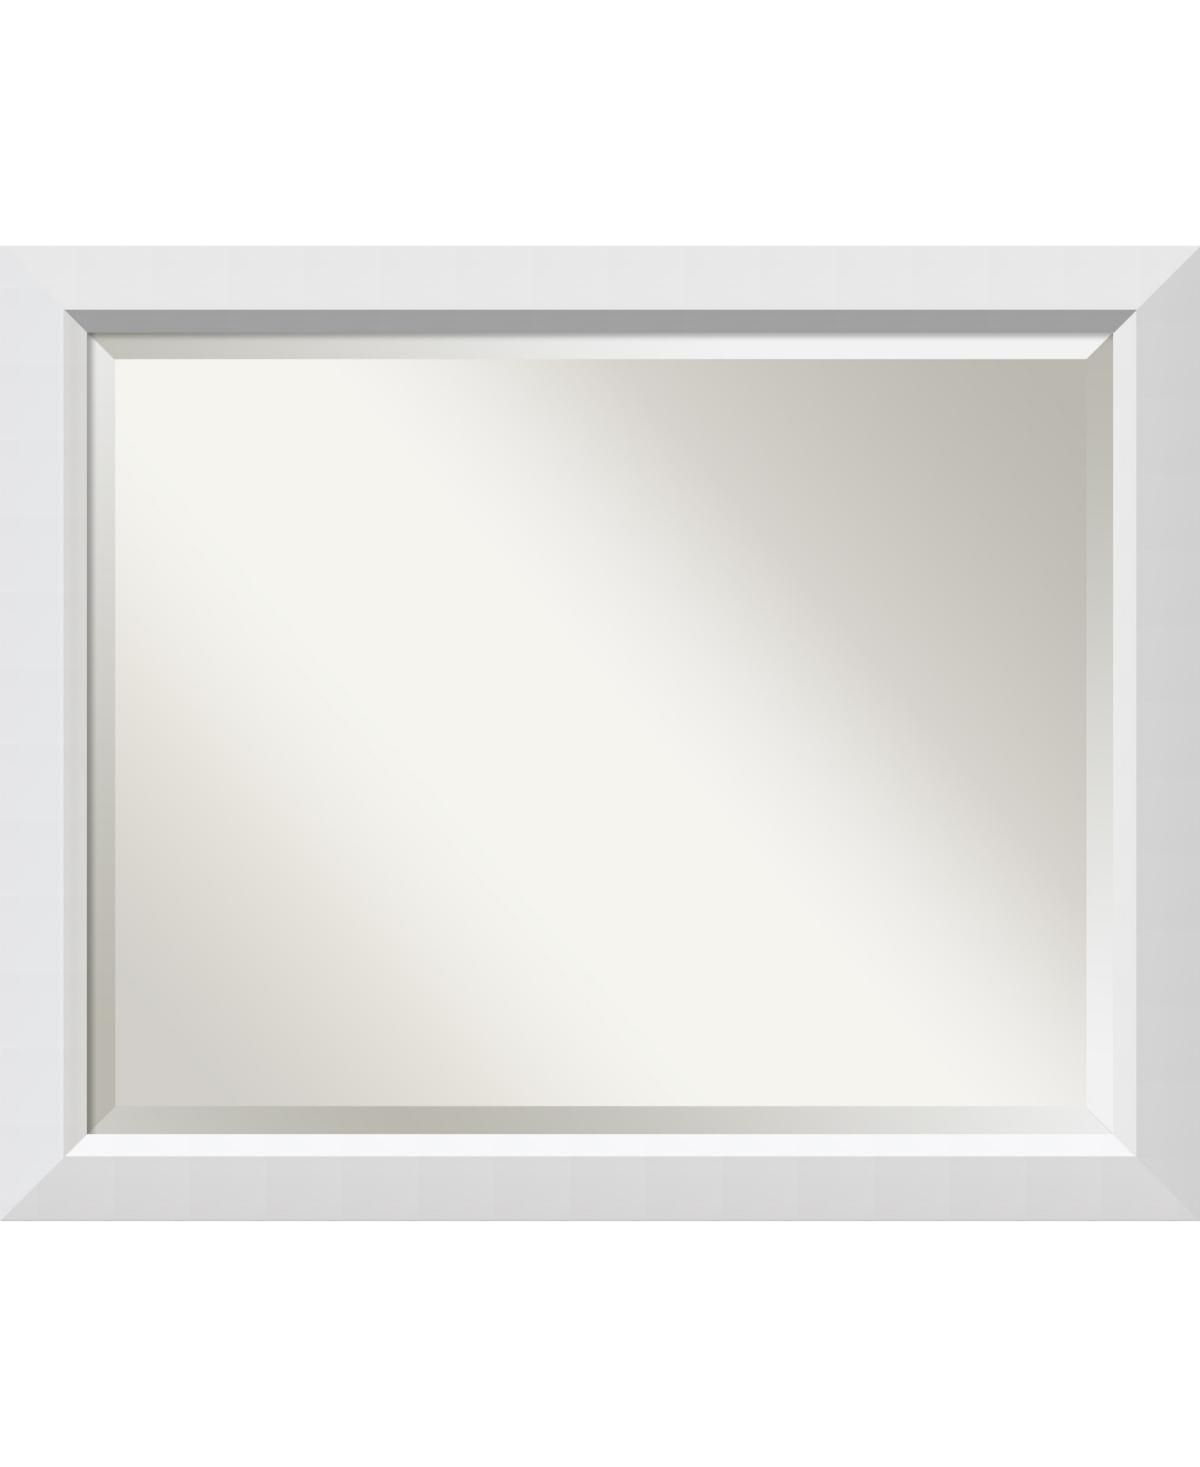 Amanti Art Blanco 32x26 Bathroom Mirror